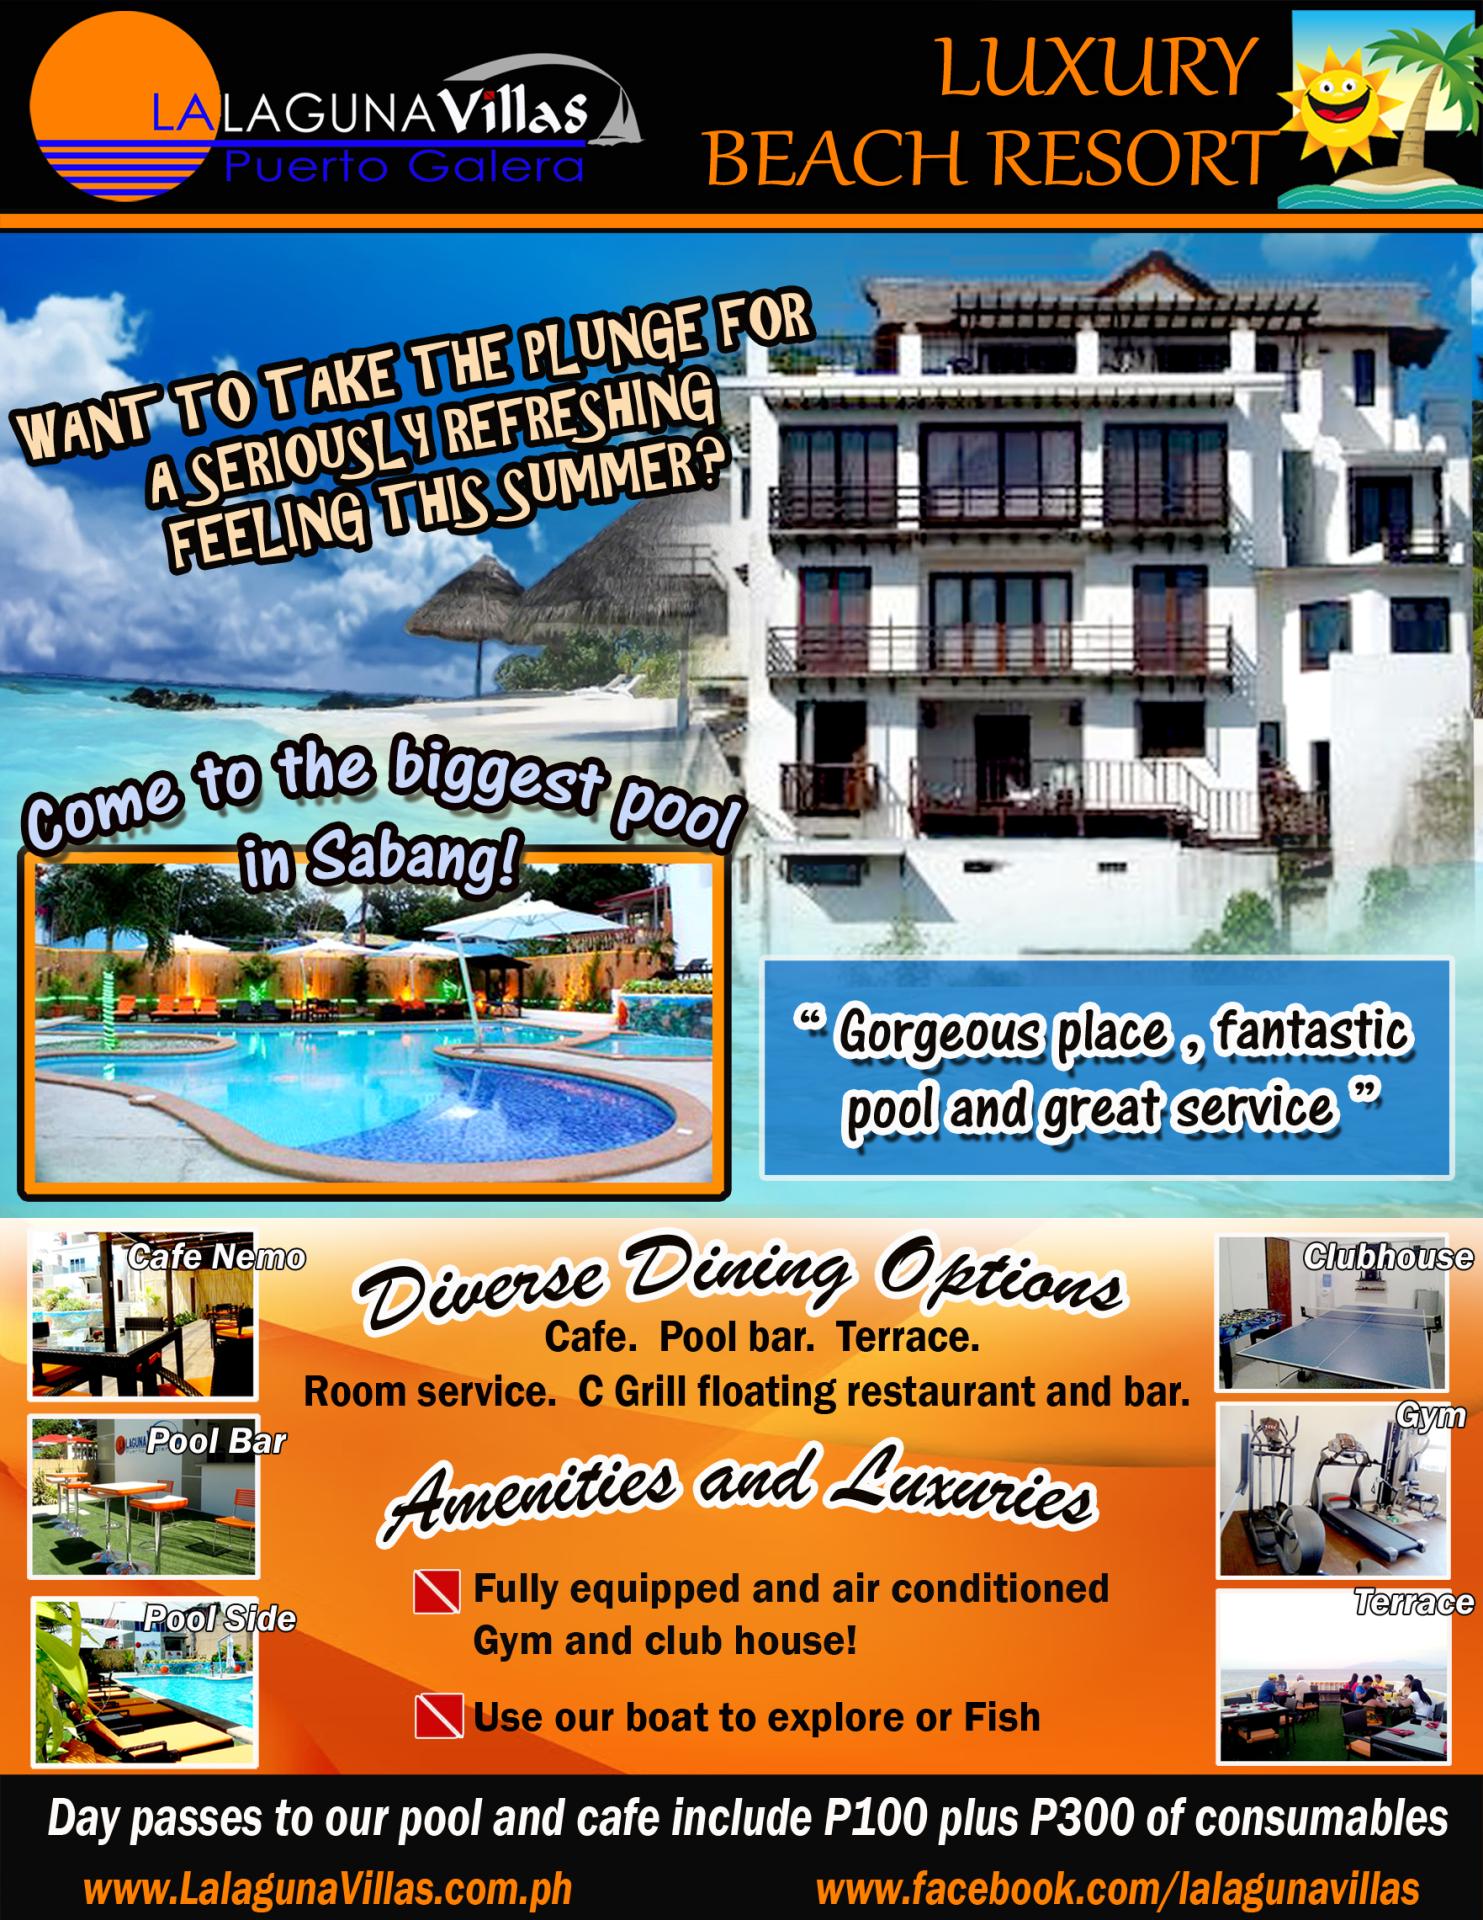 Small Lalaguna Beach, Sabang, Puerto Galera, Mindoro, PHL 5203 info@lalagunavillas.com.ph +63 43 287 3696 Text +63 917 446 5722